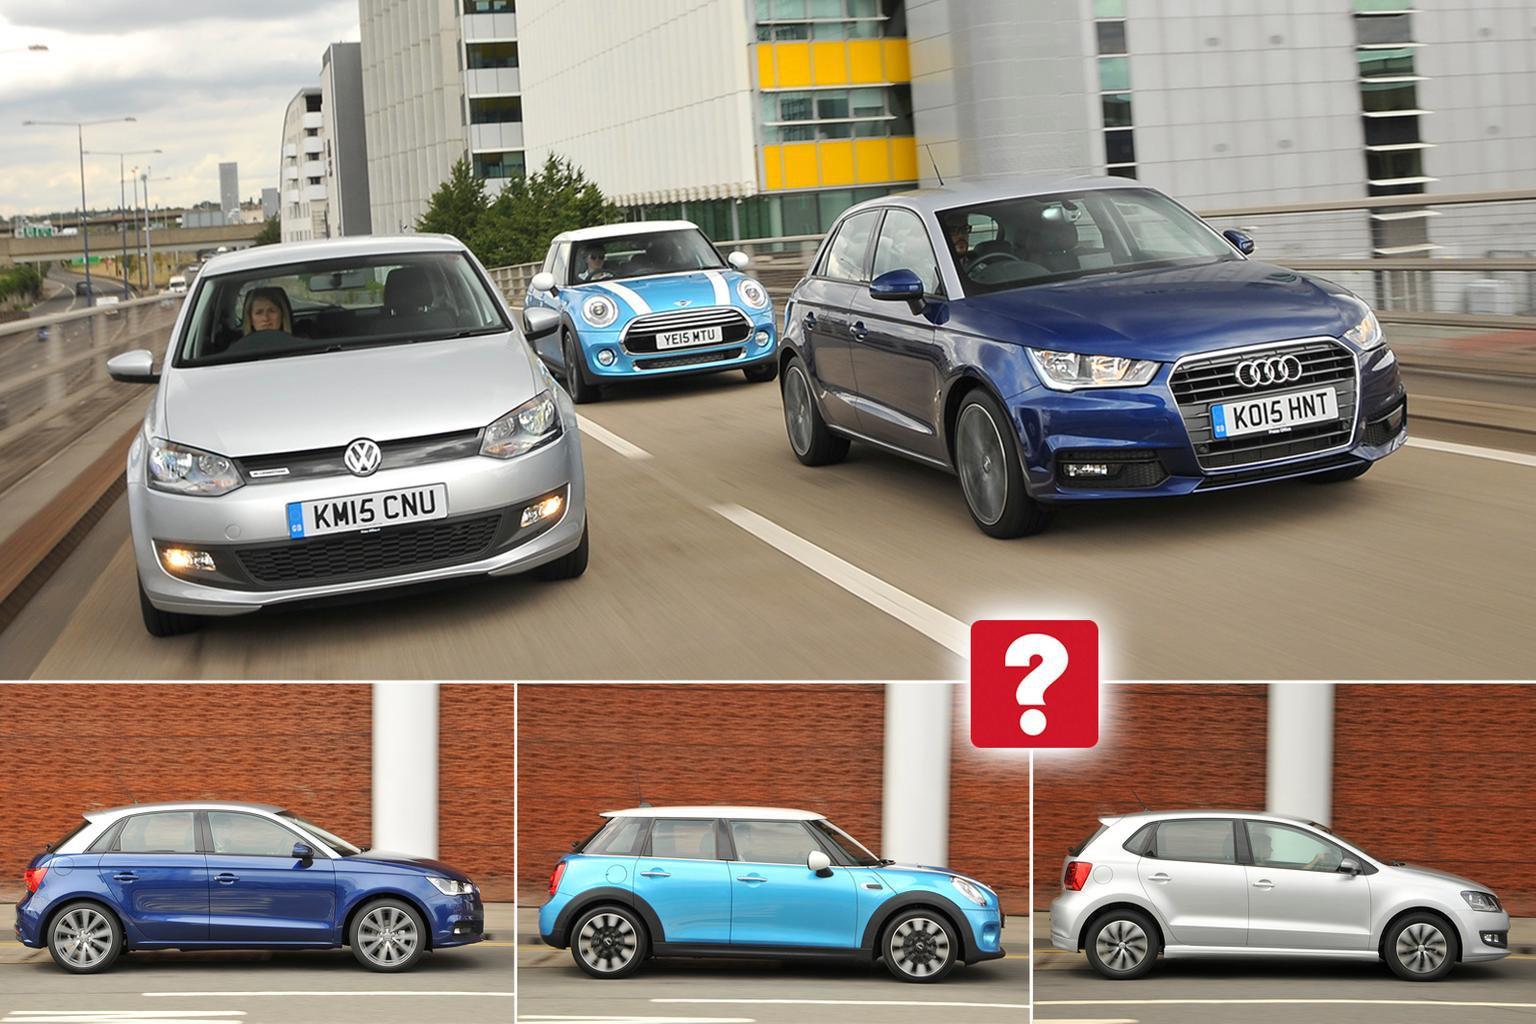 Used test: Audi A1 vs Mini hatch vs Volkswagen Polo | What Car?